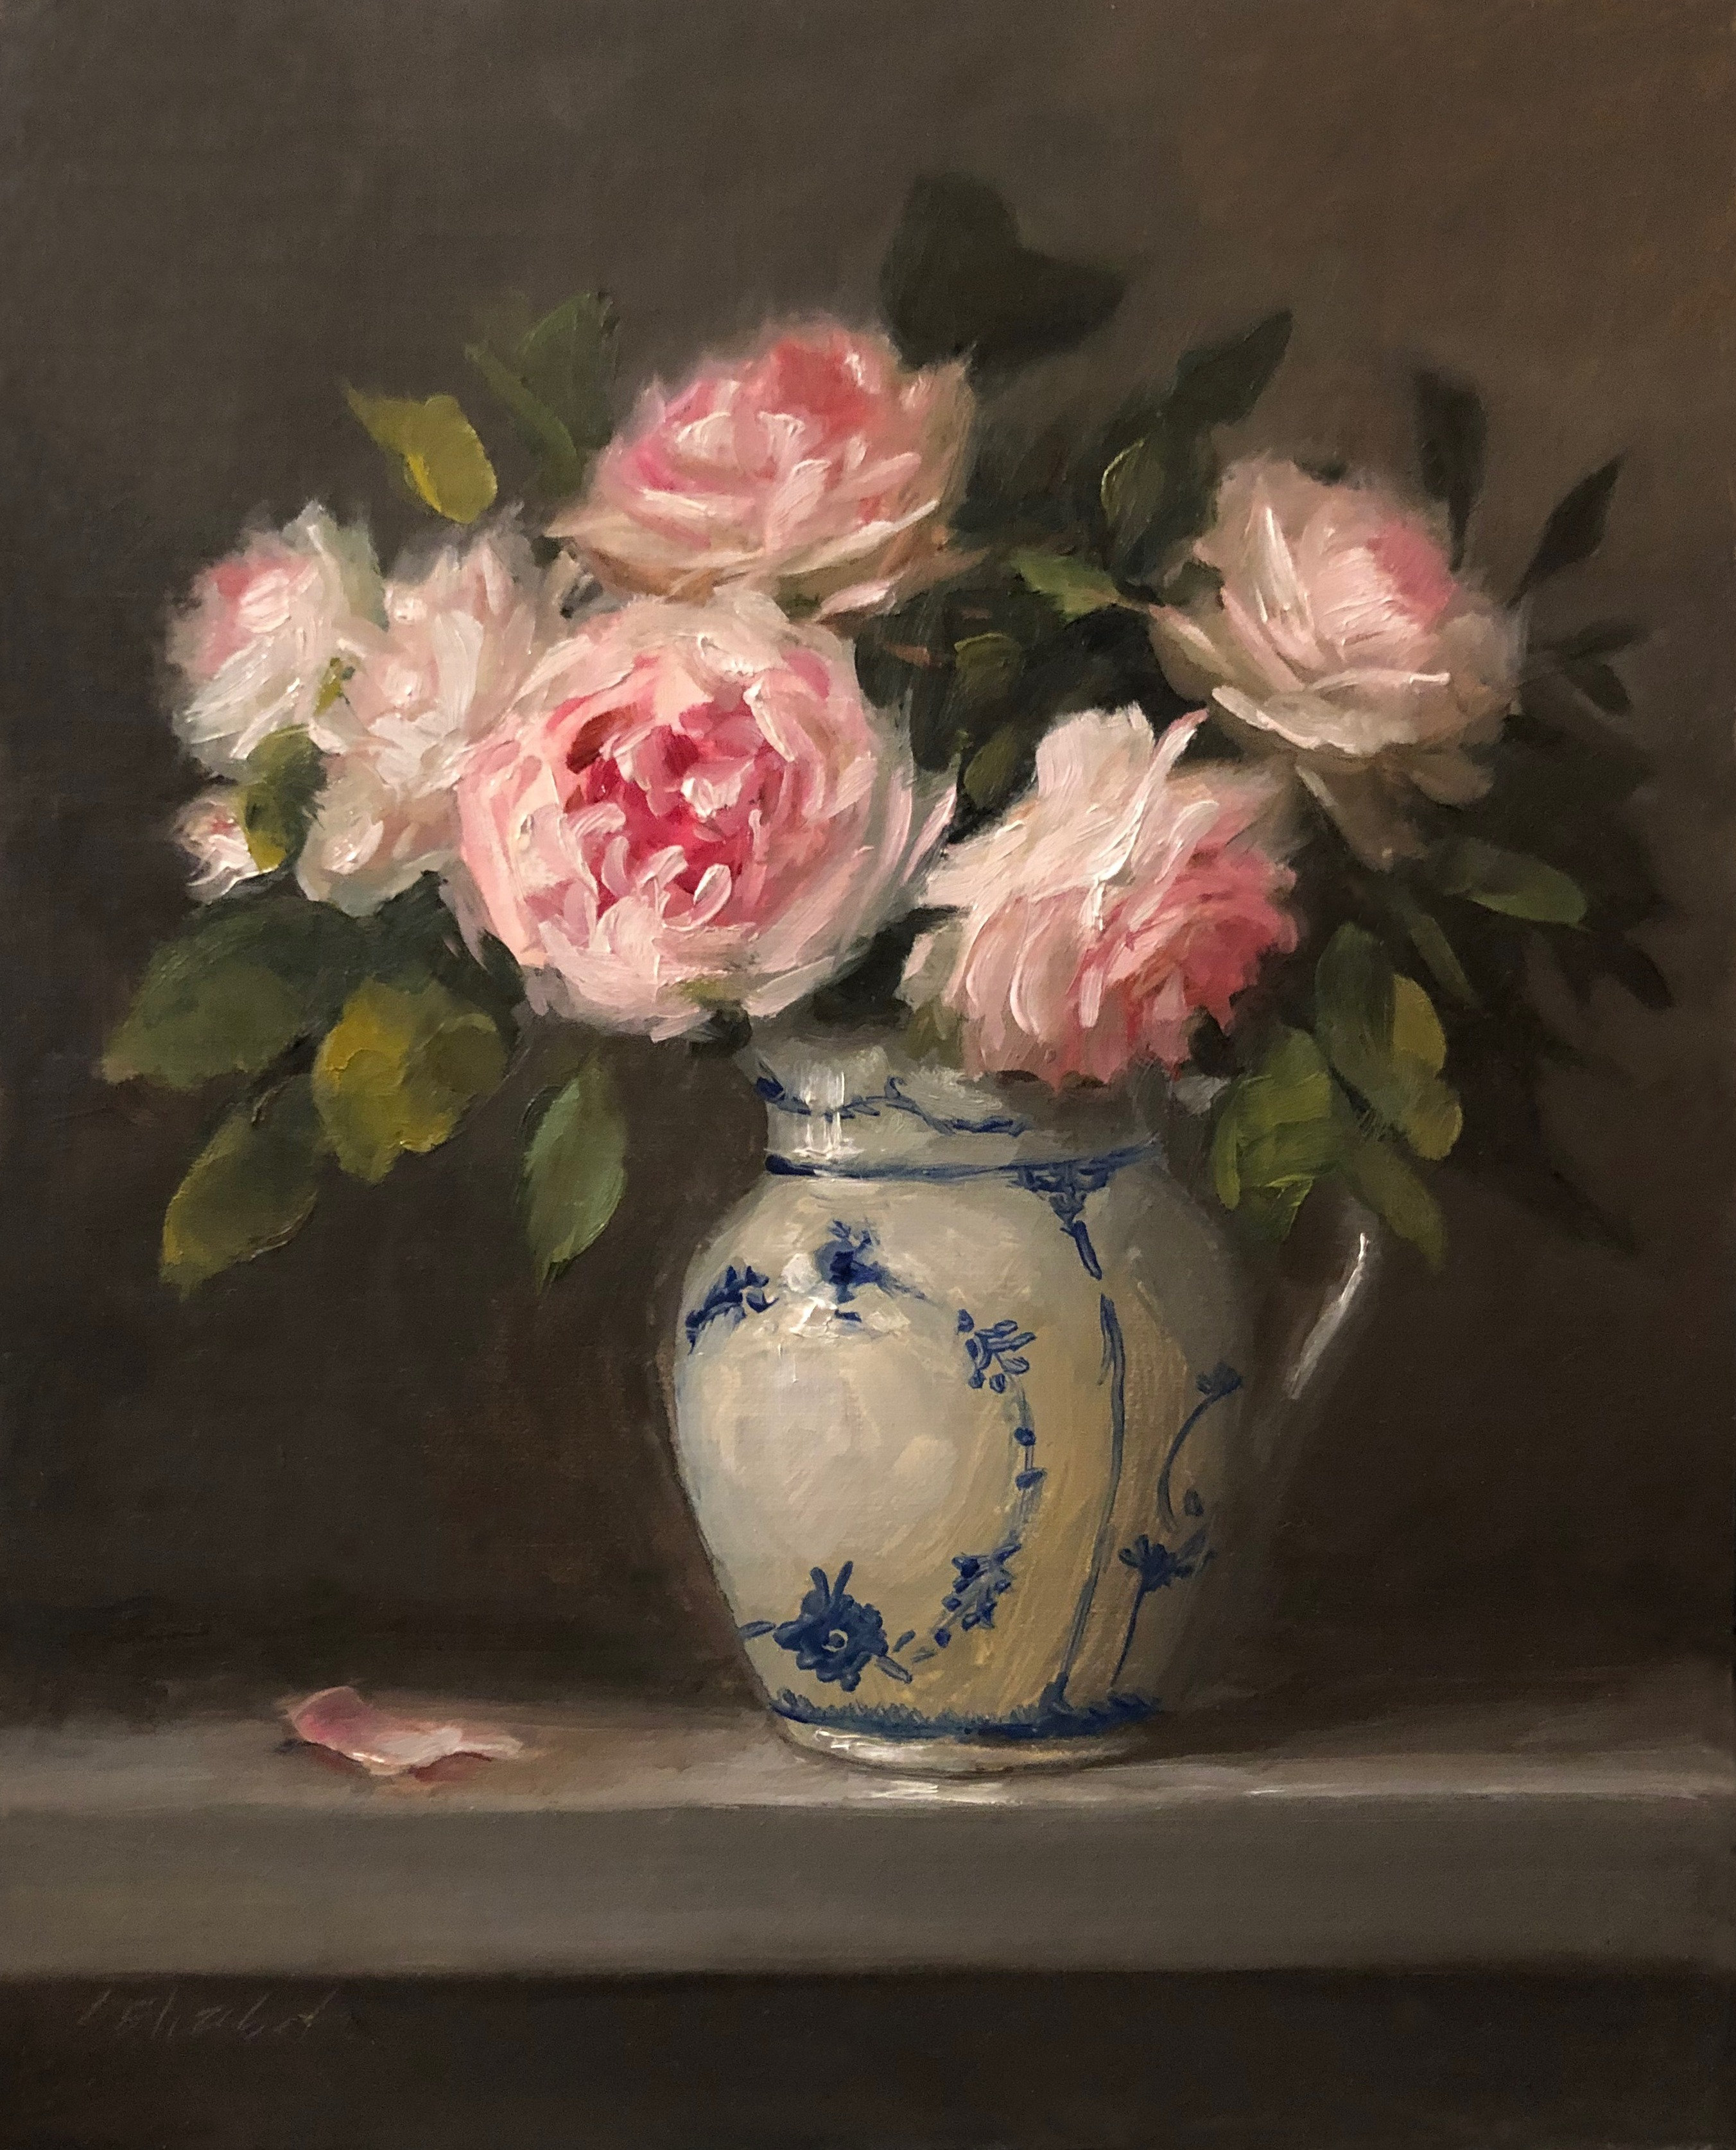 Roses in Royal Copenhagen Original Oil Painting on 8